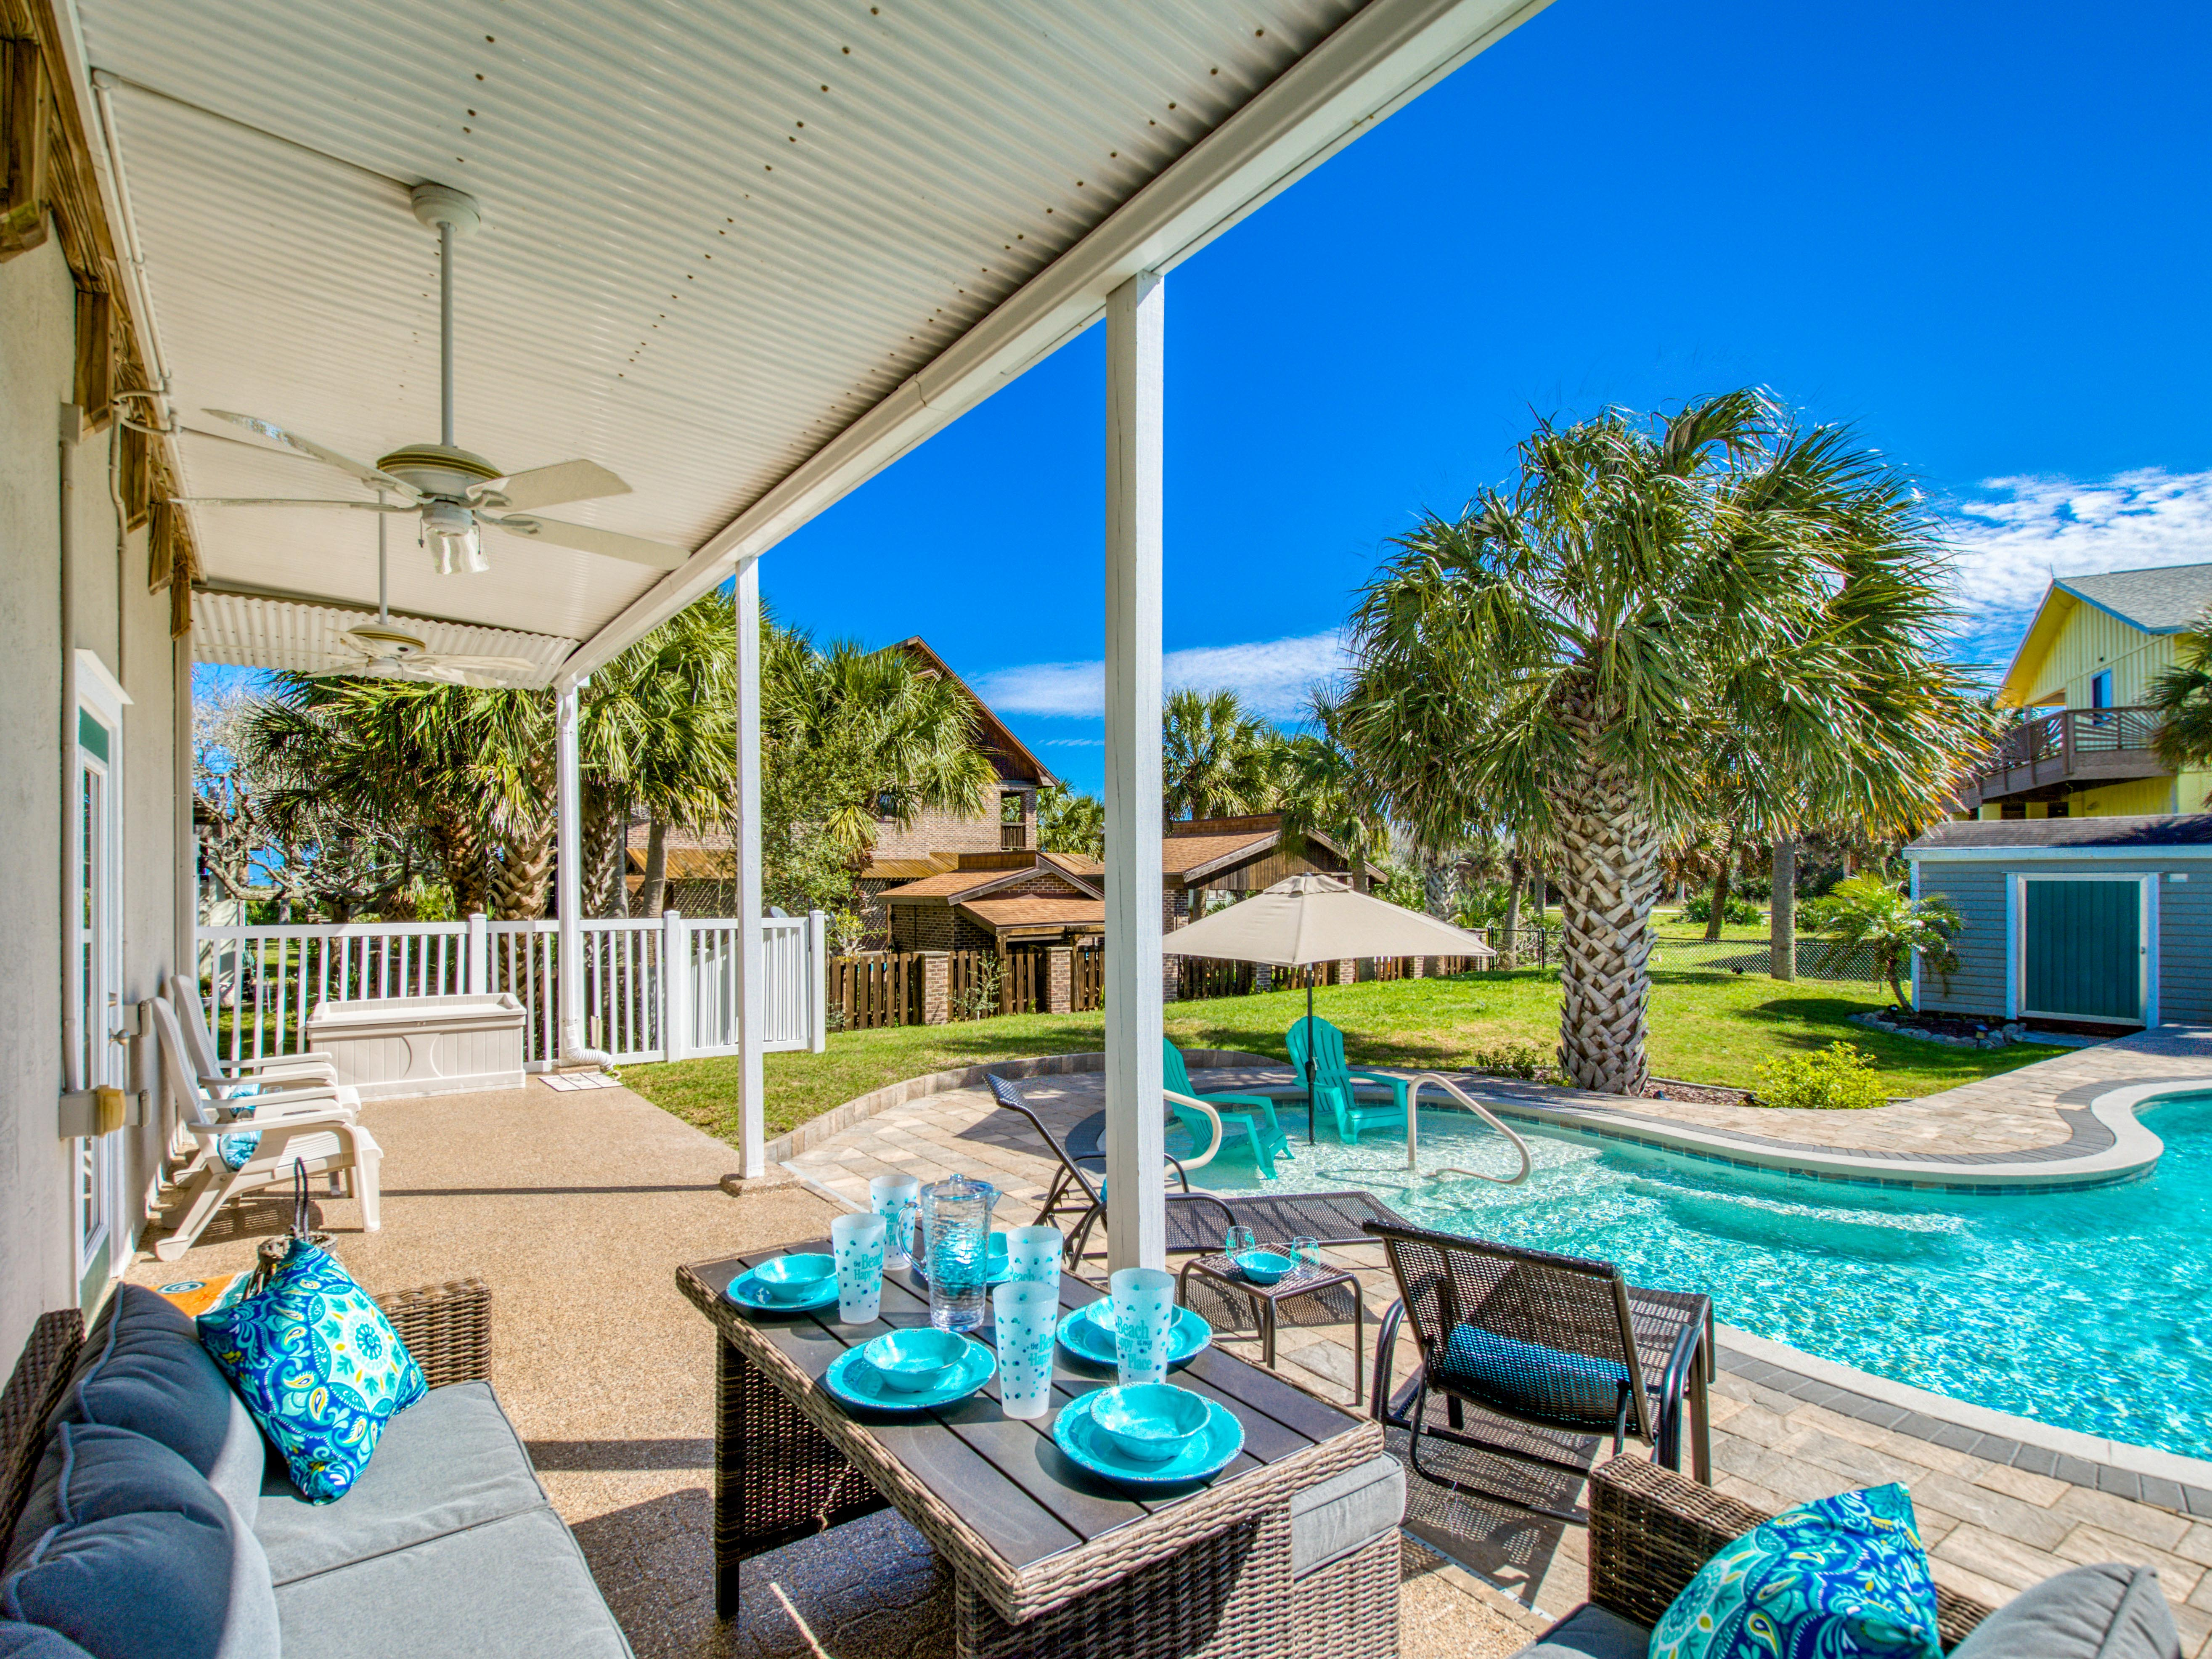 Palm Coast FL Vacation Rental Welcome to Palm